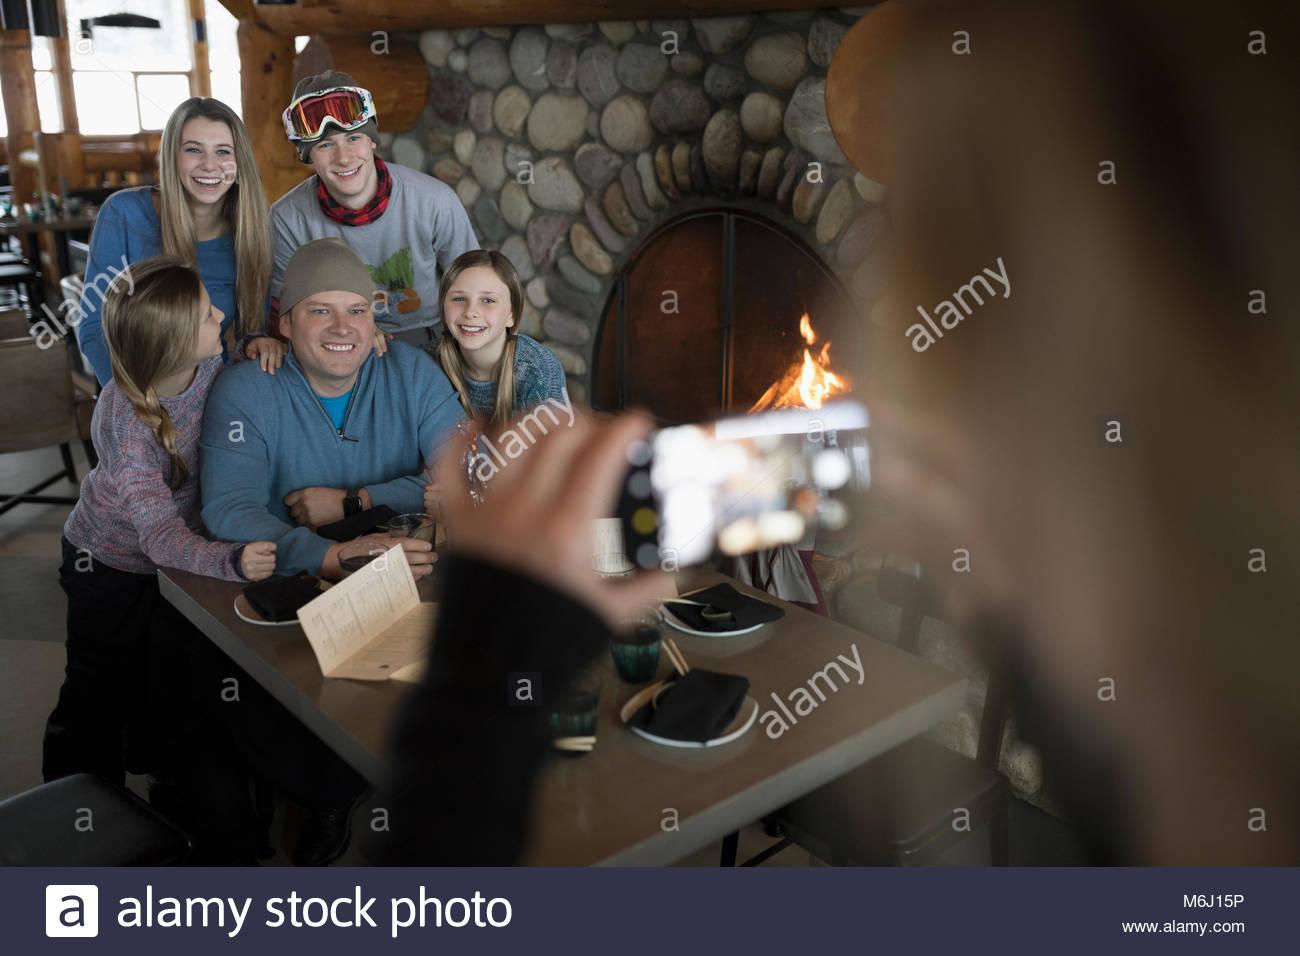 Woman photographing family skiers at ski resort lodge fireside apres-ski - Stock Image